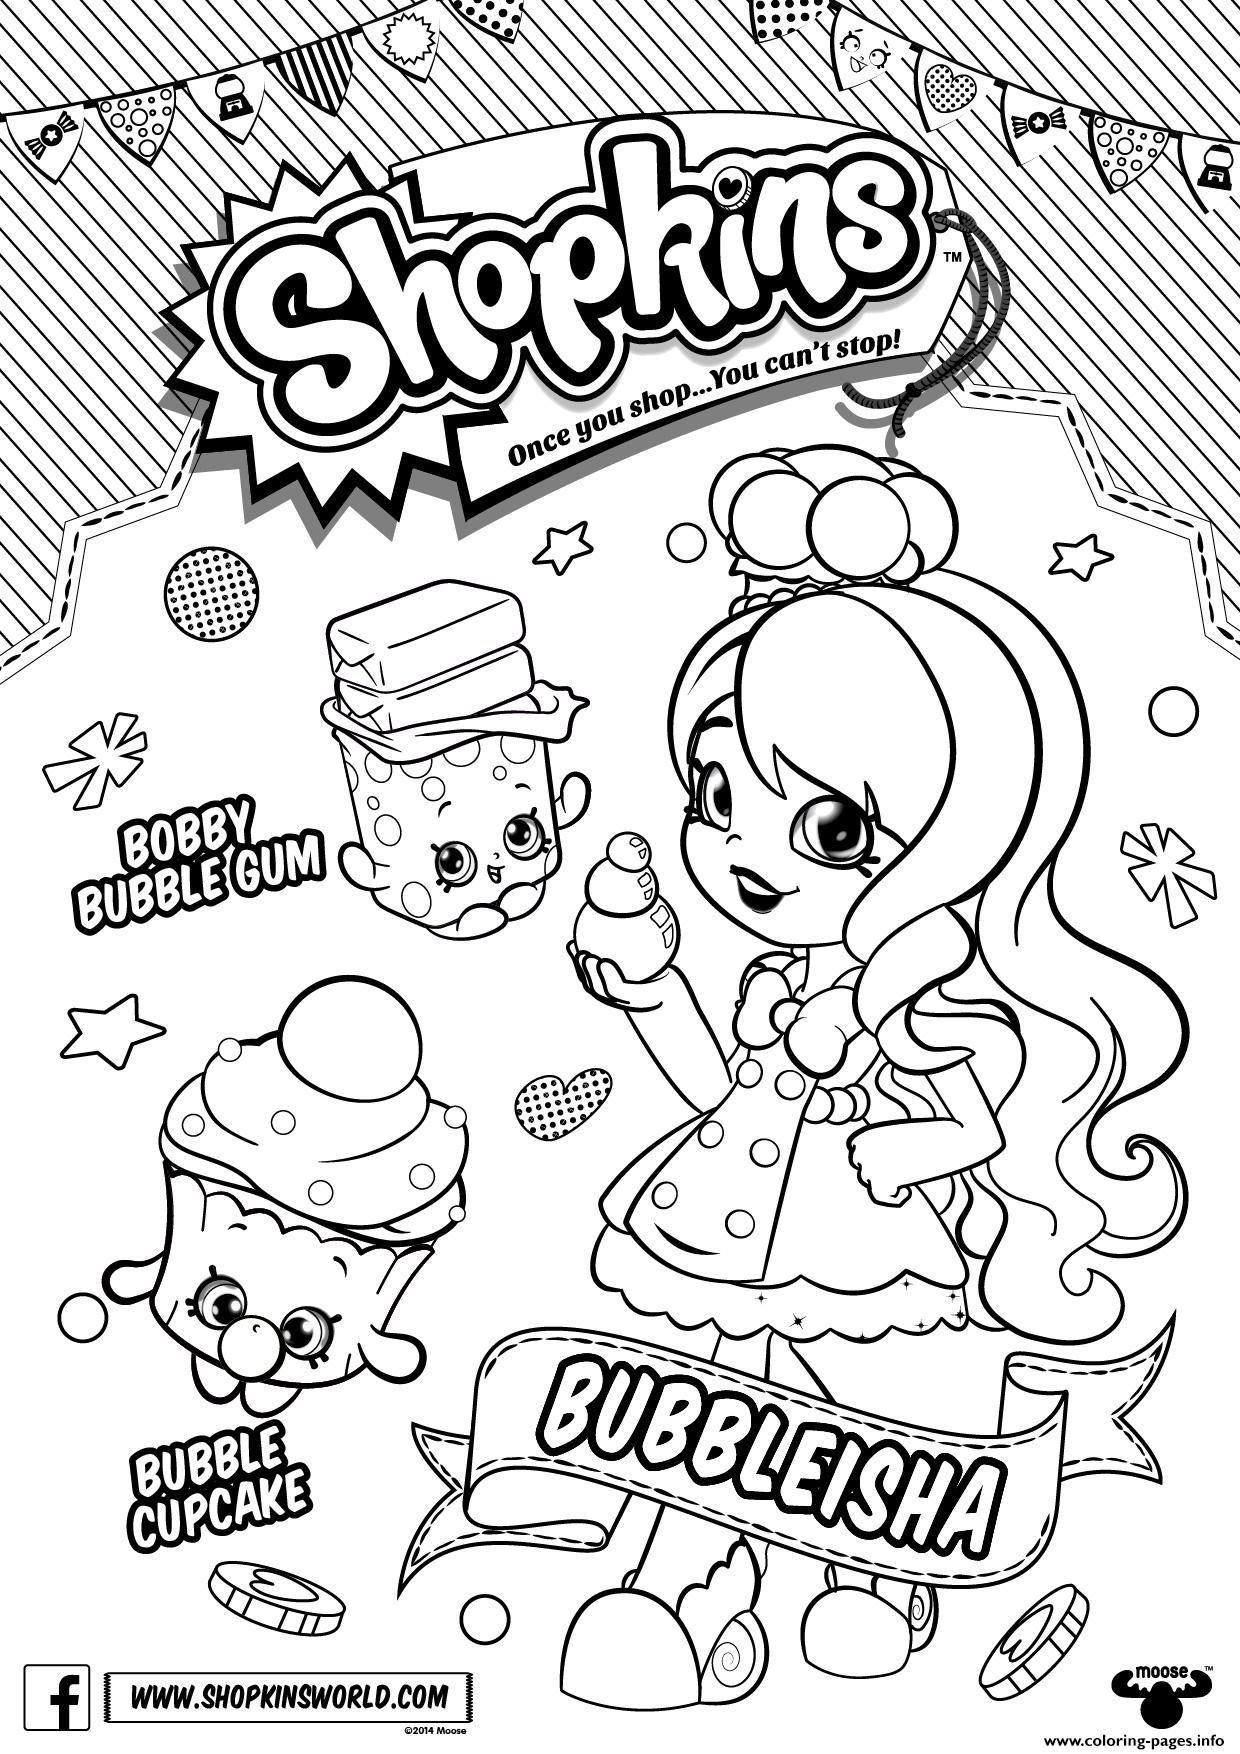 Print Bubbleisha Shopkins Shoppies With Bubble Gum Coloring Pages